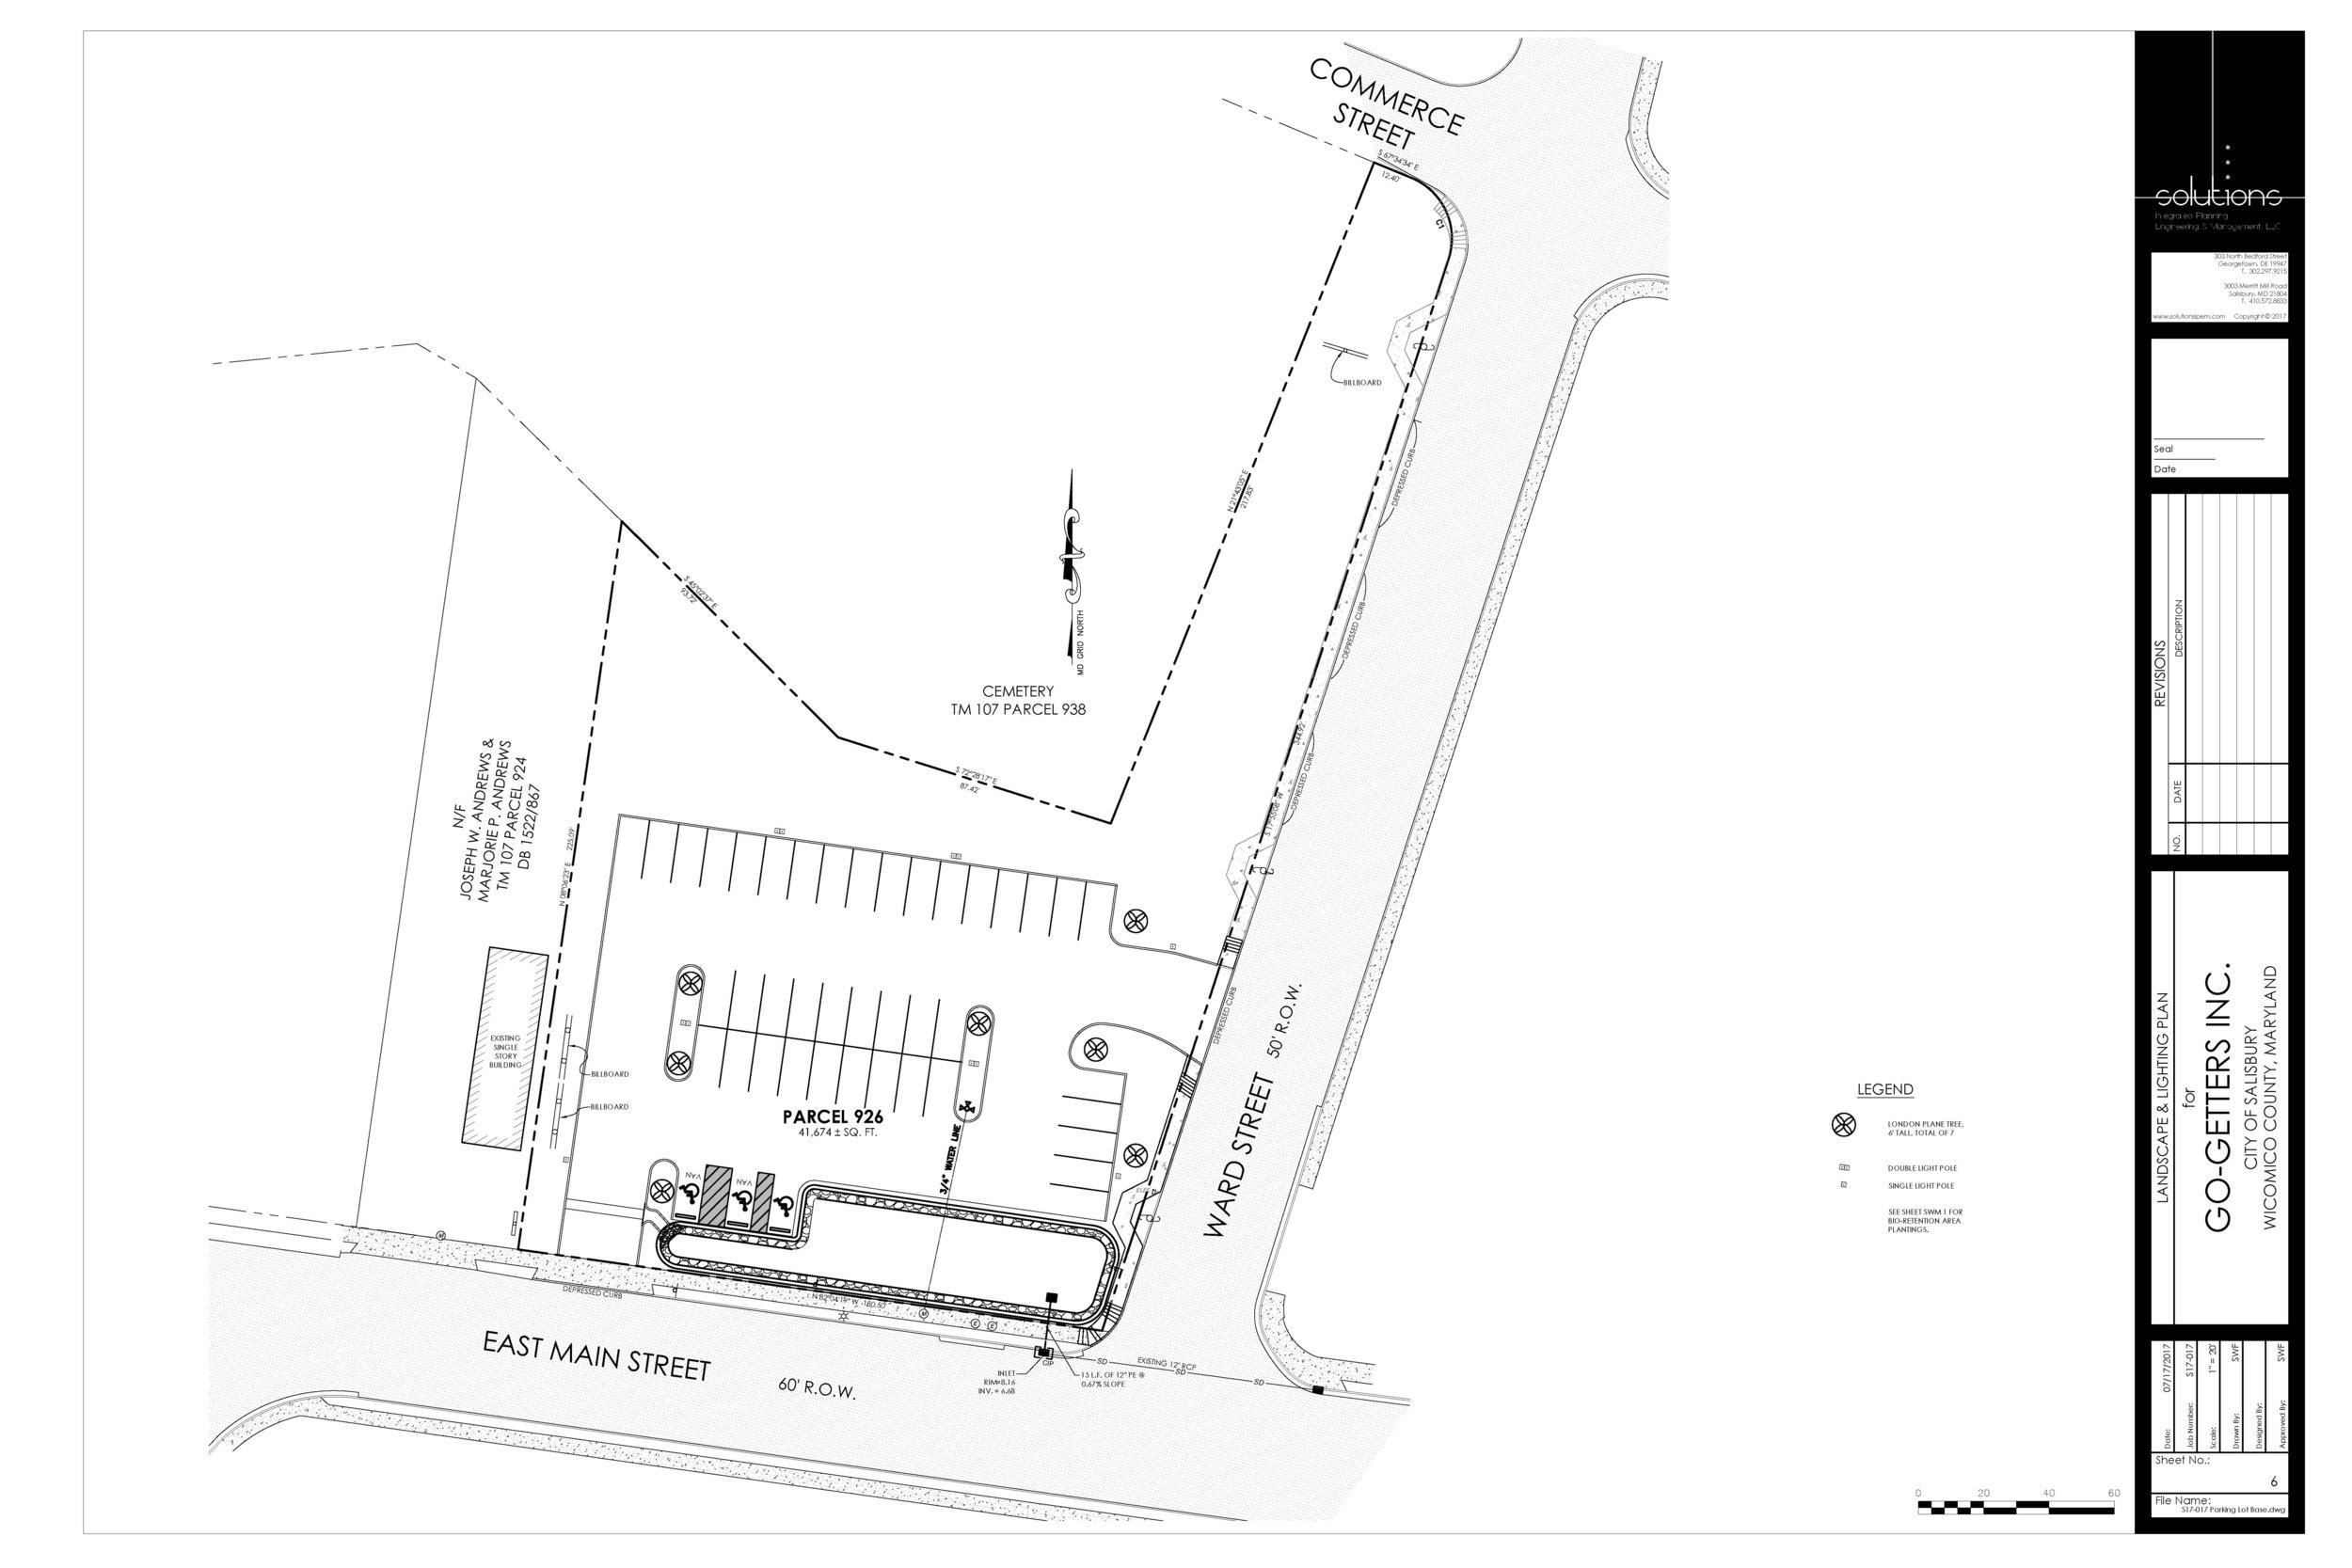 S17-017 Parking Lot Plans 11-21-17 6.jpg